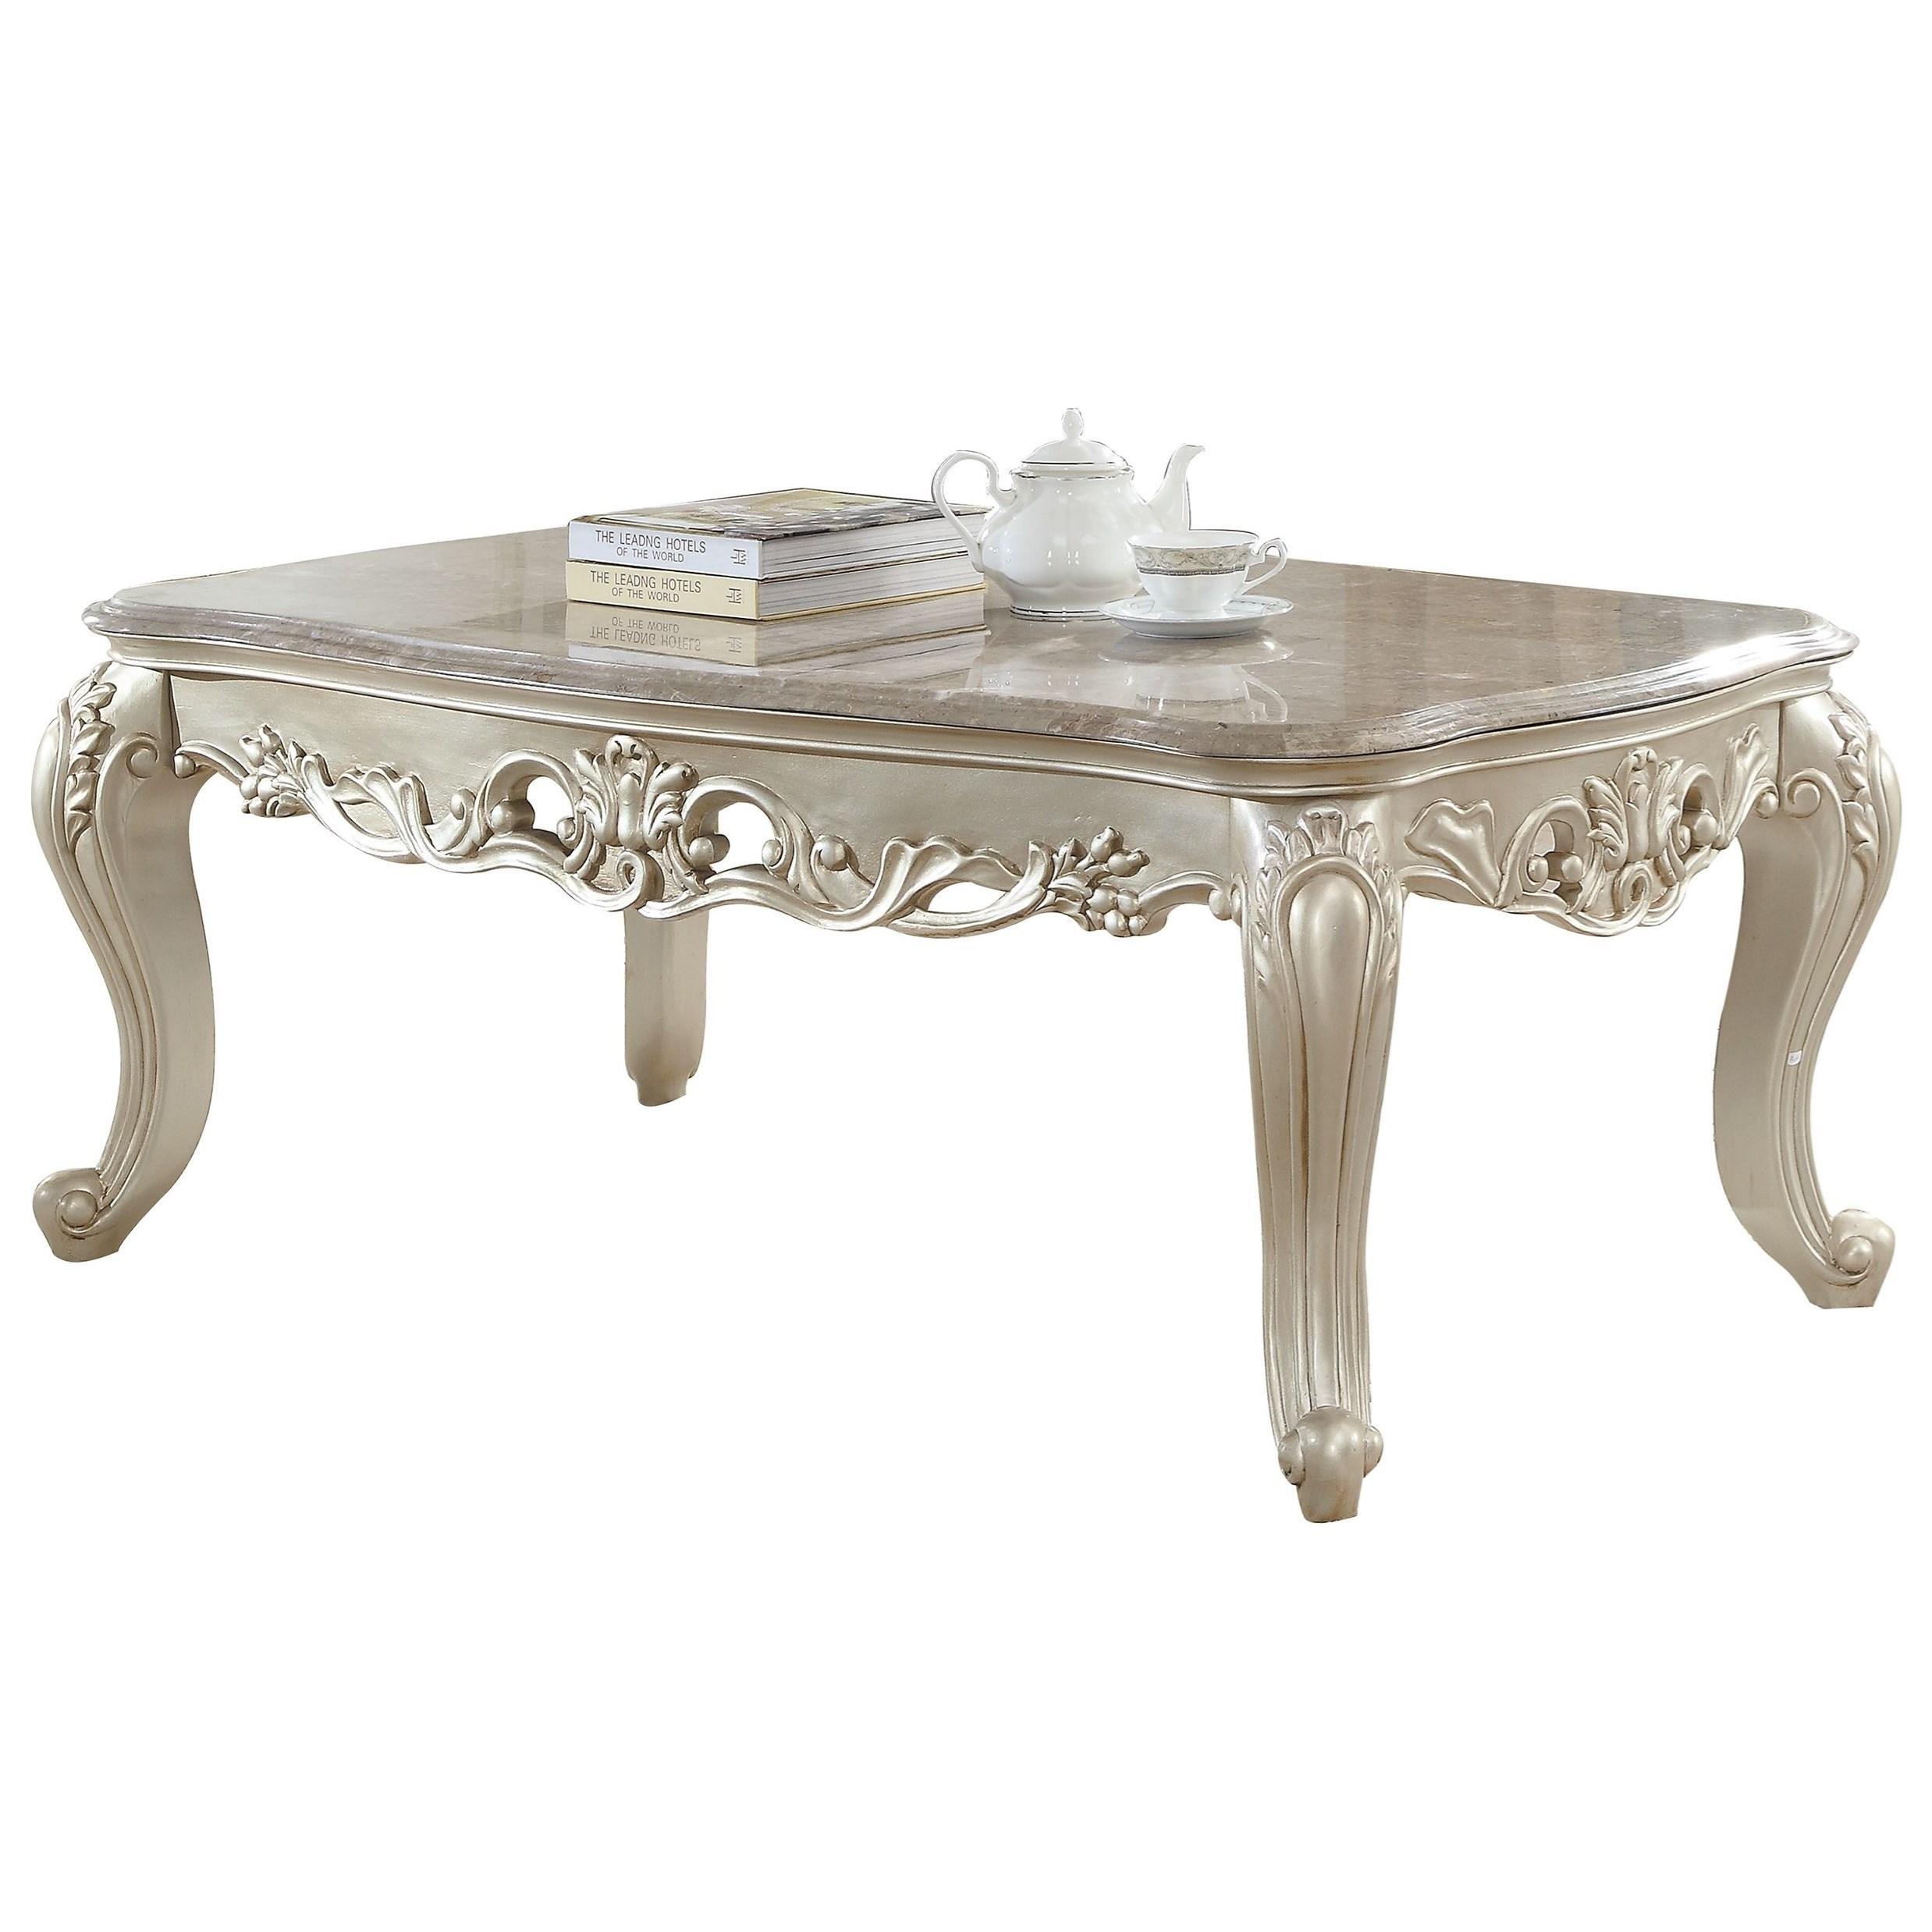 Gorsedd Coffee Table by Acme Furniture at Carolina Direct